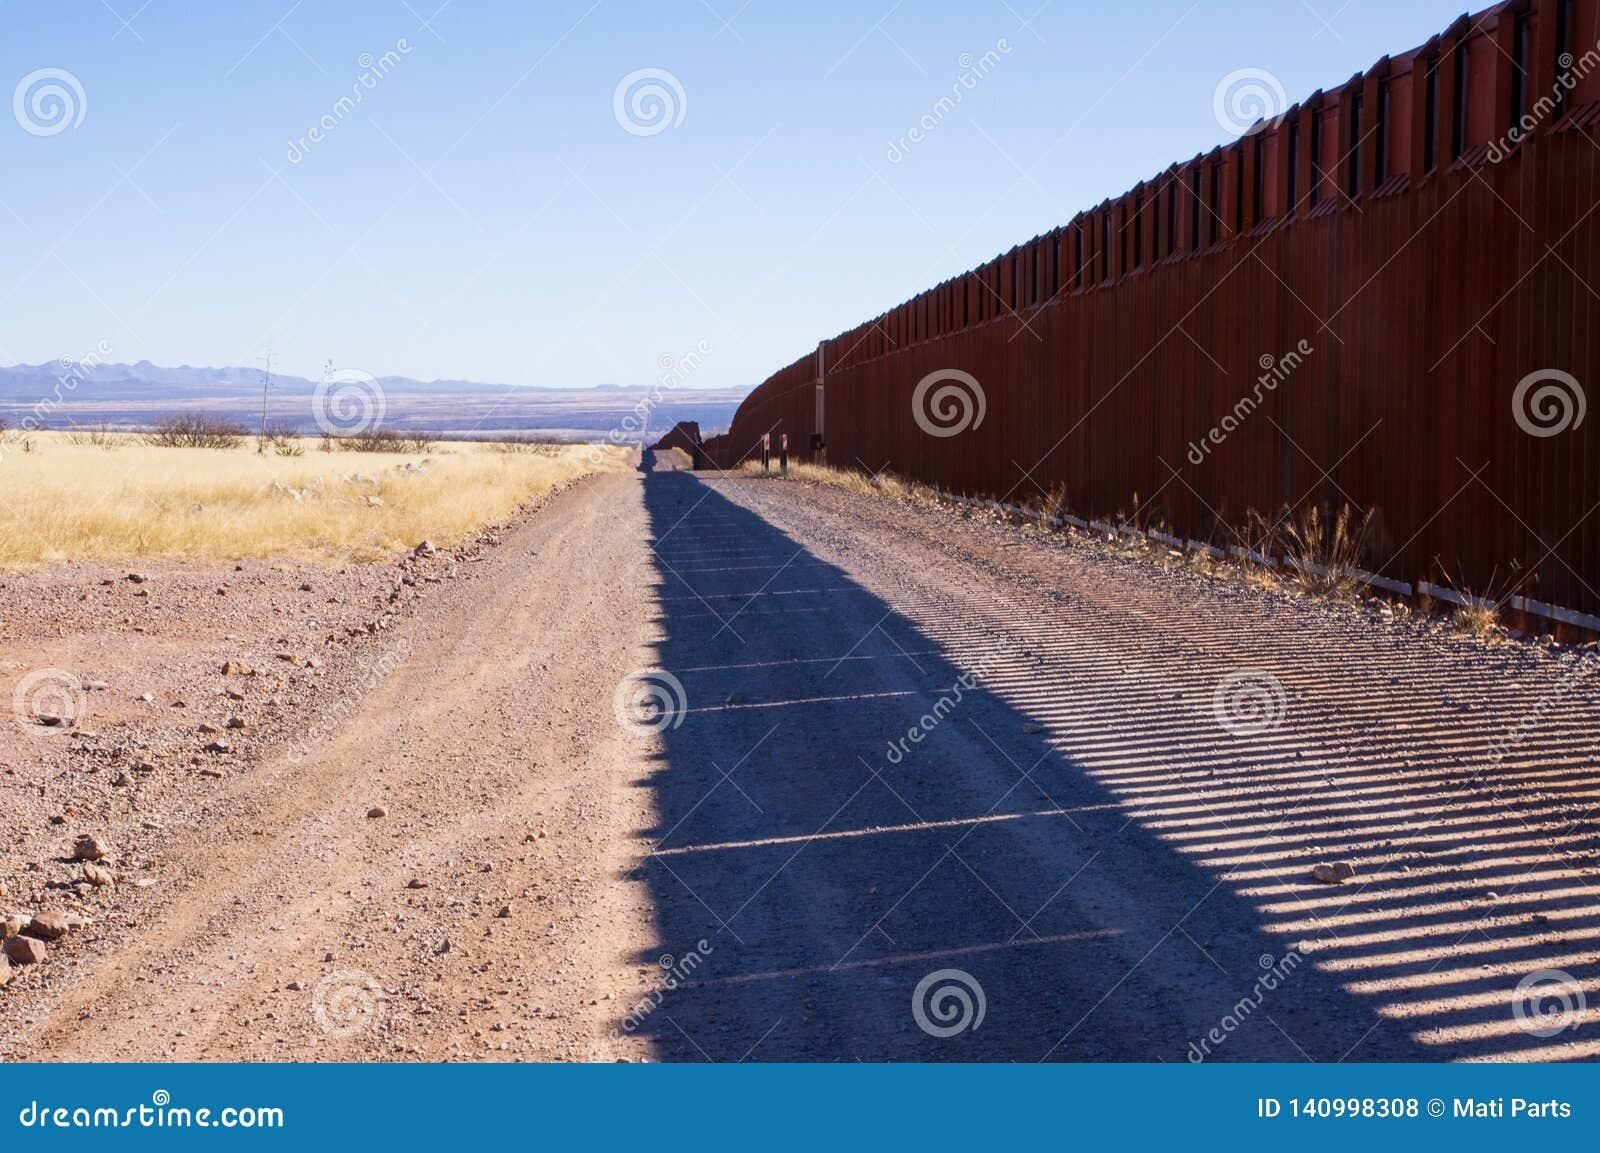 The US-Mexico border wall in Arizona desert